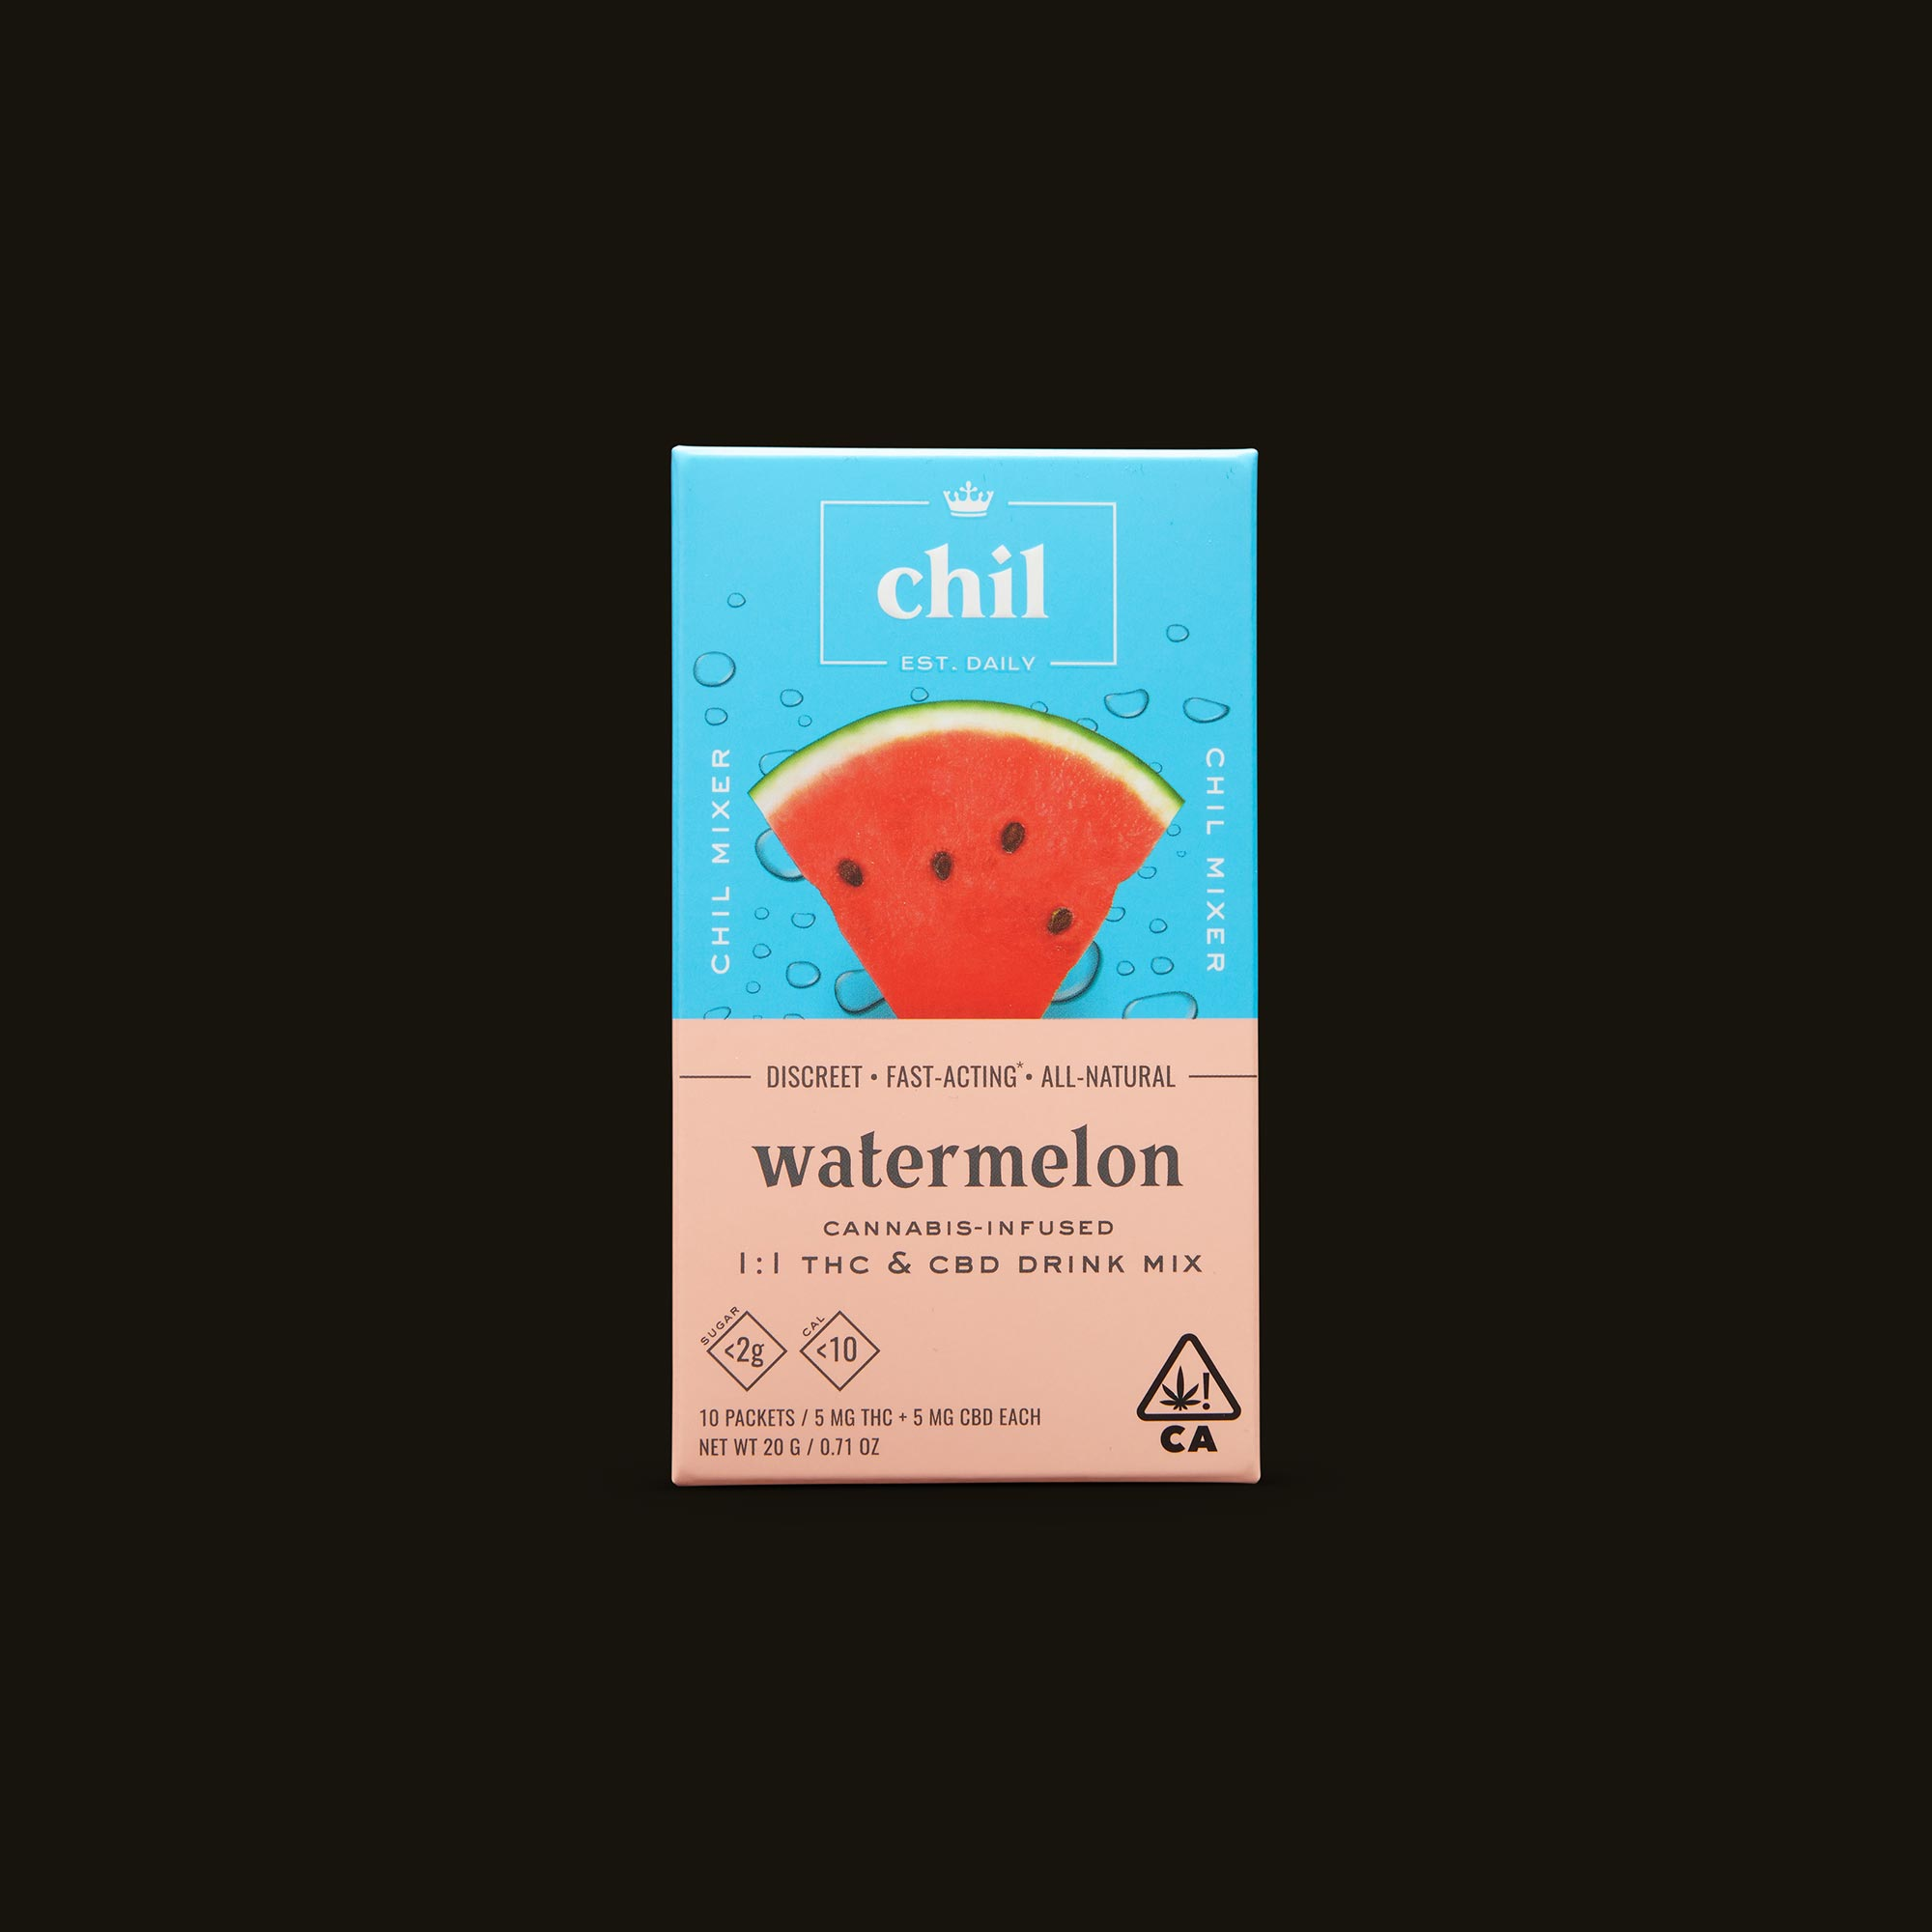 Chil Watermelon 1:1 Mixer Front Box